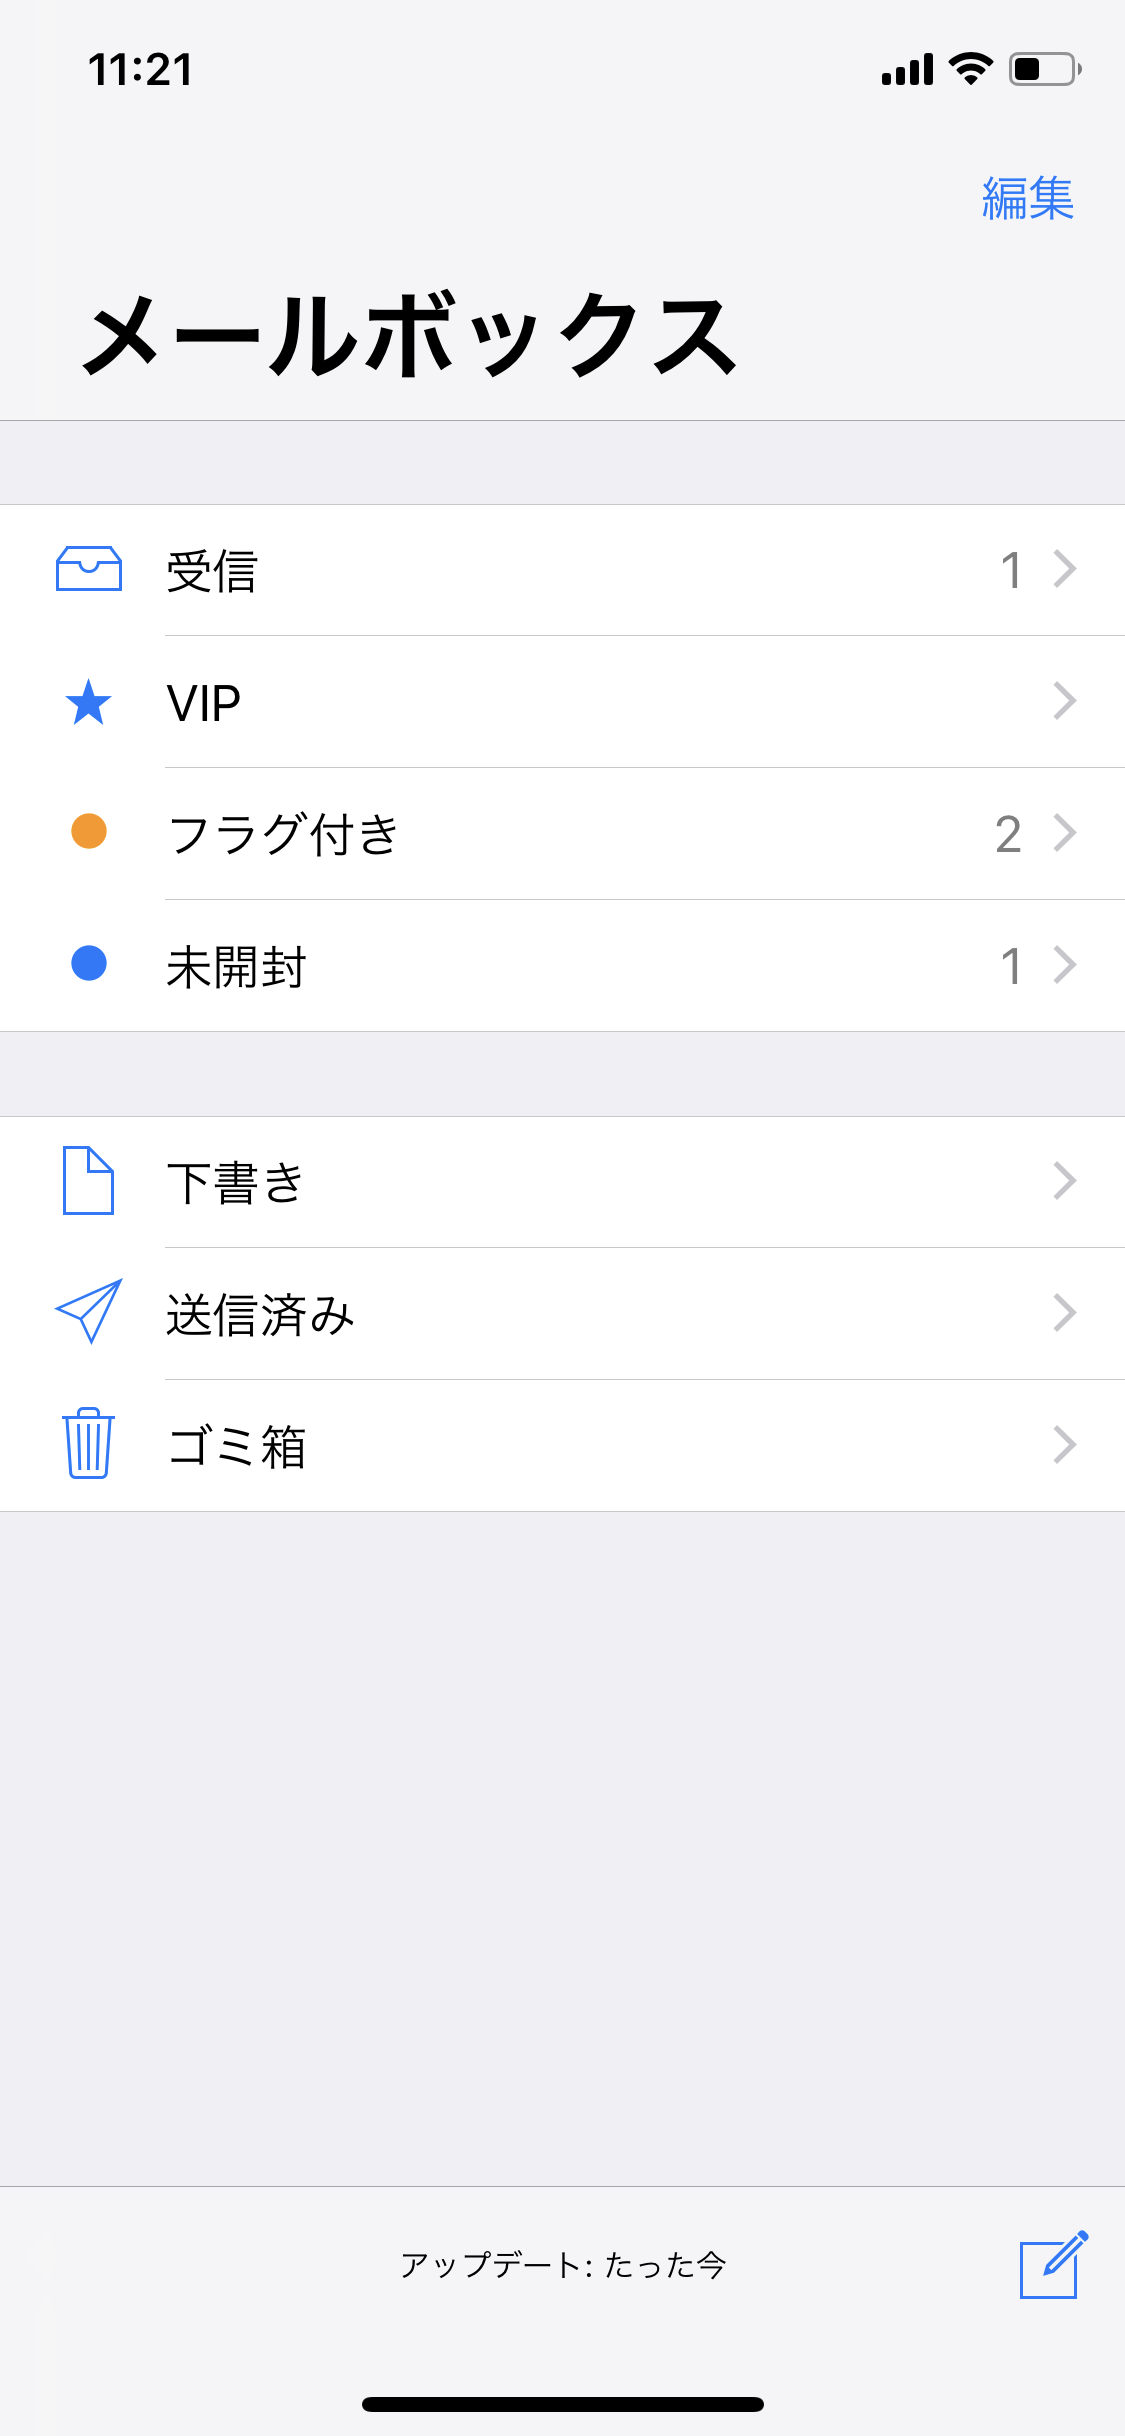 Iphone 迷惑 メール フォルダ